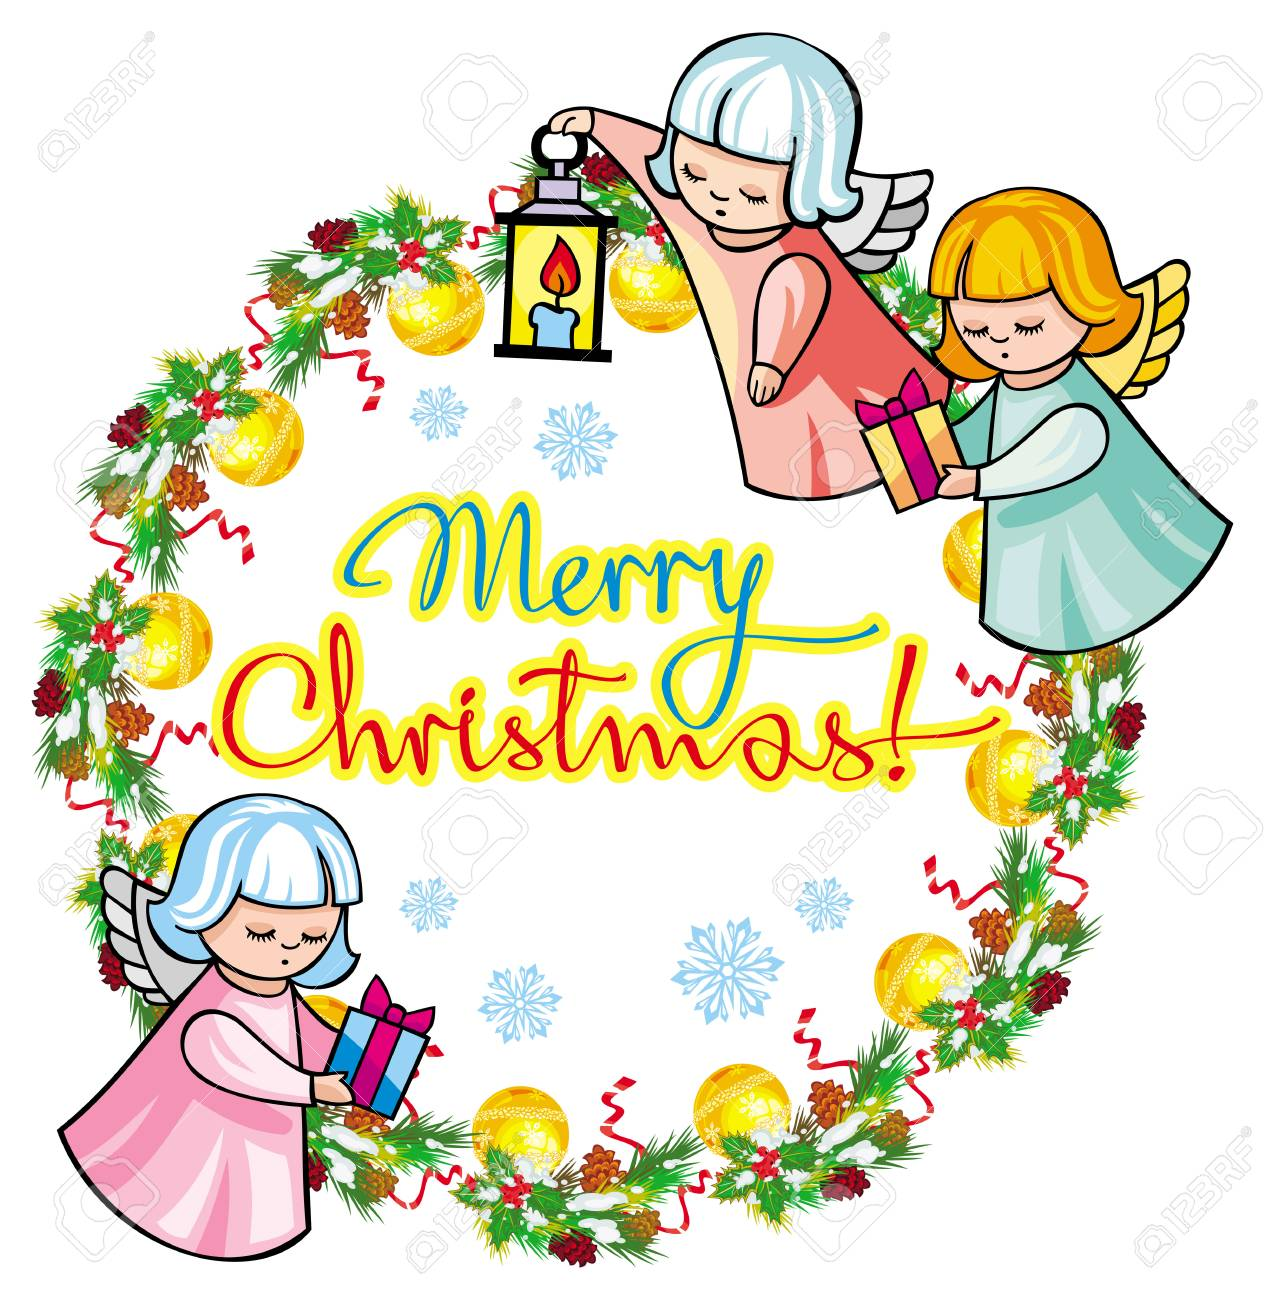 Frohe Weihnachten Clipart.Stock Photo